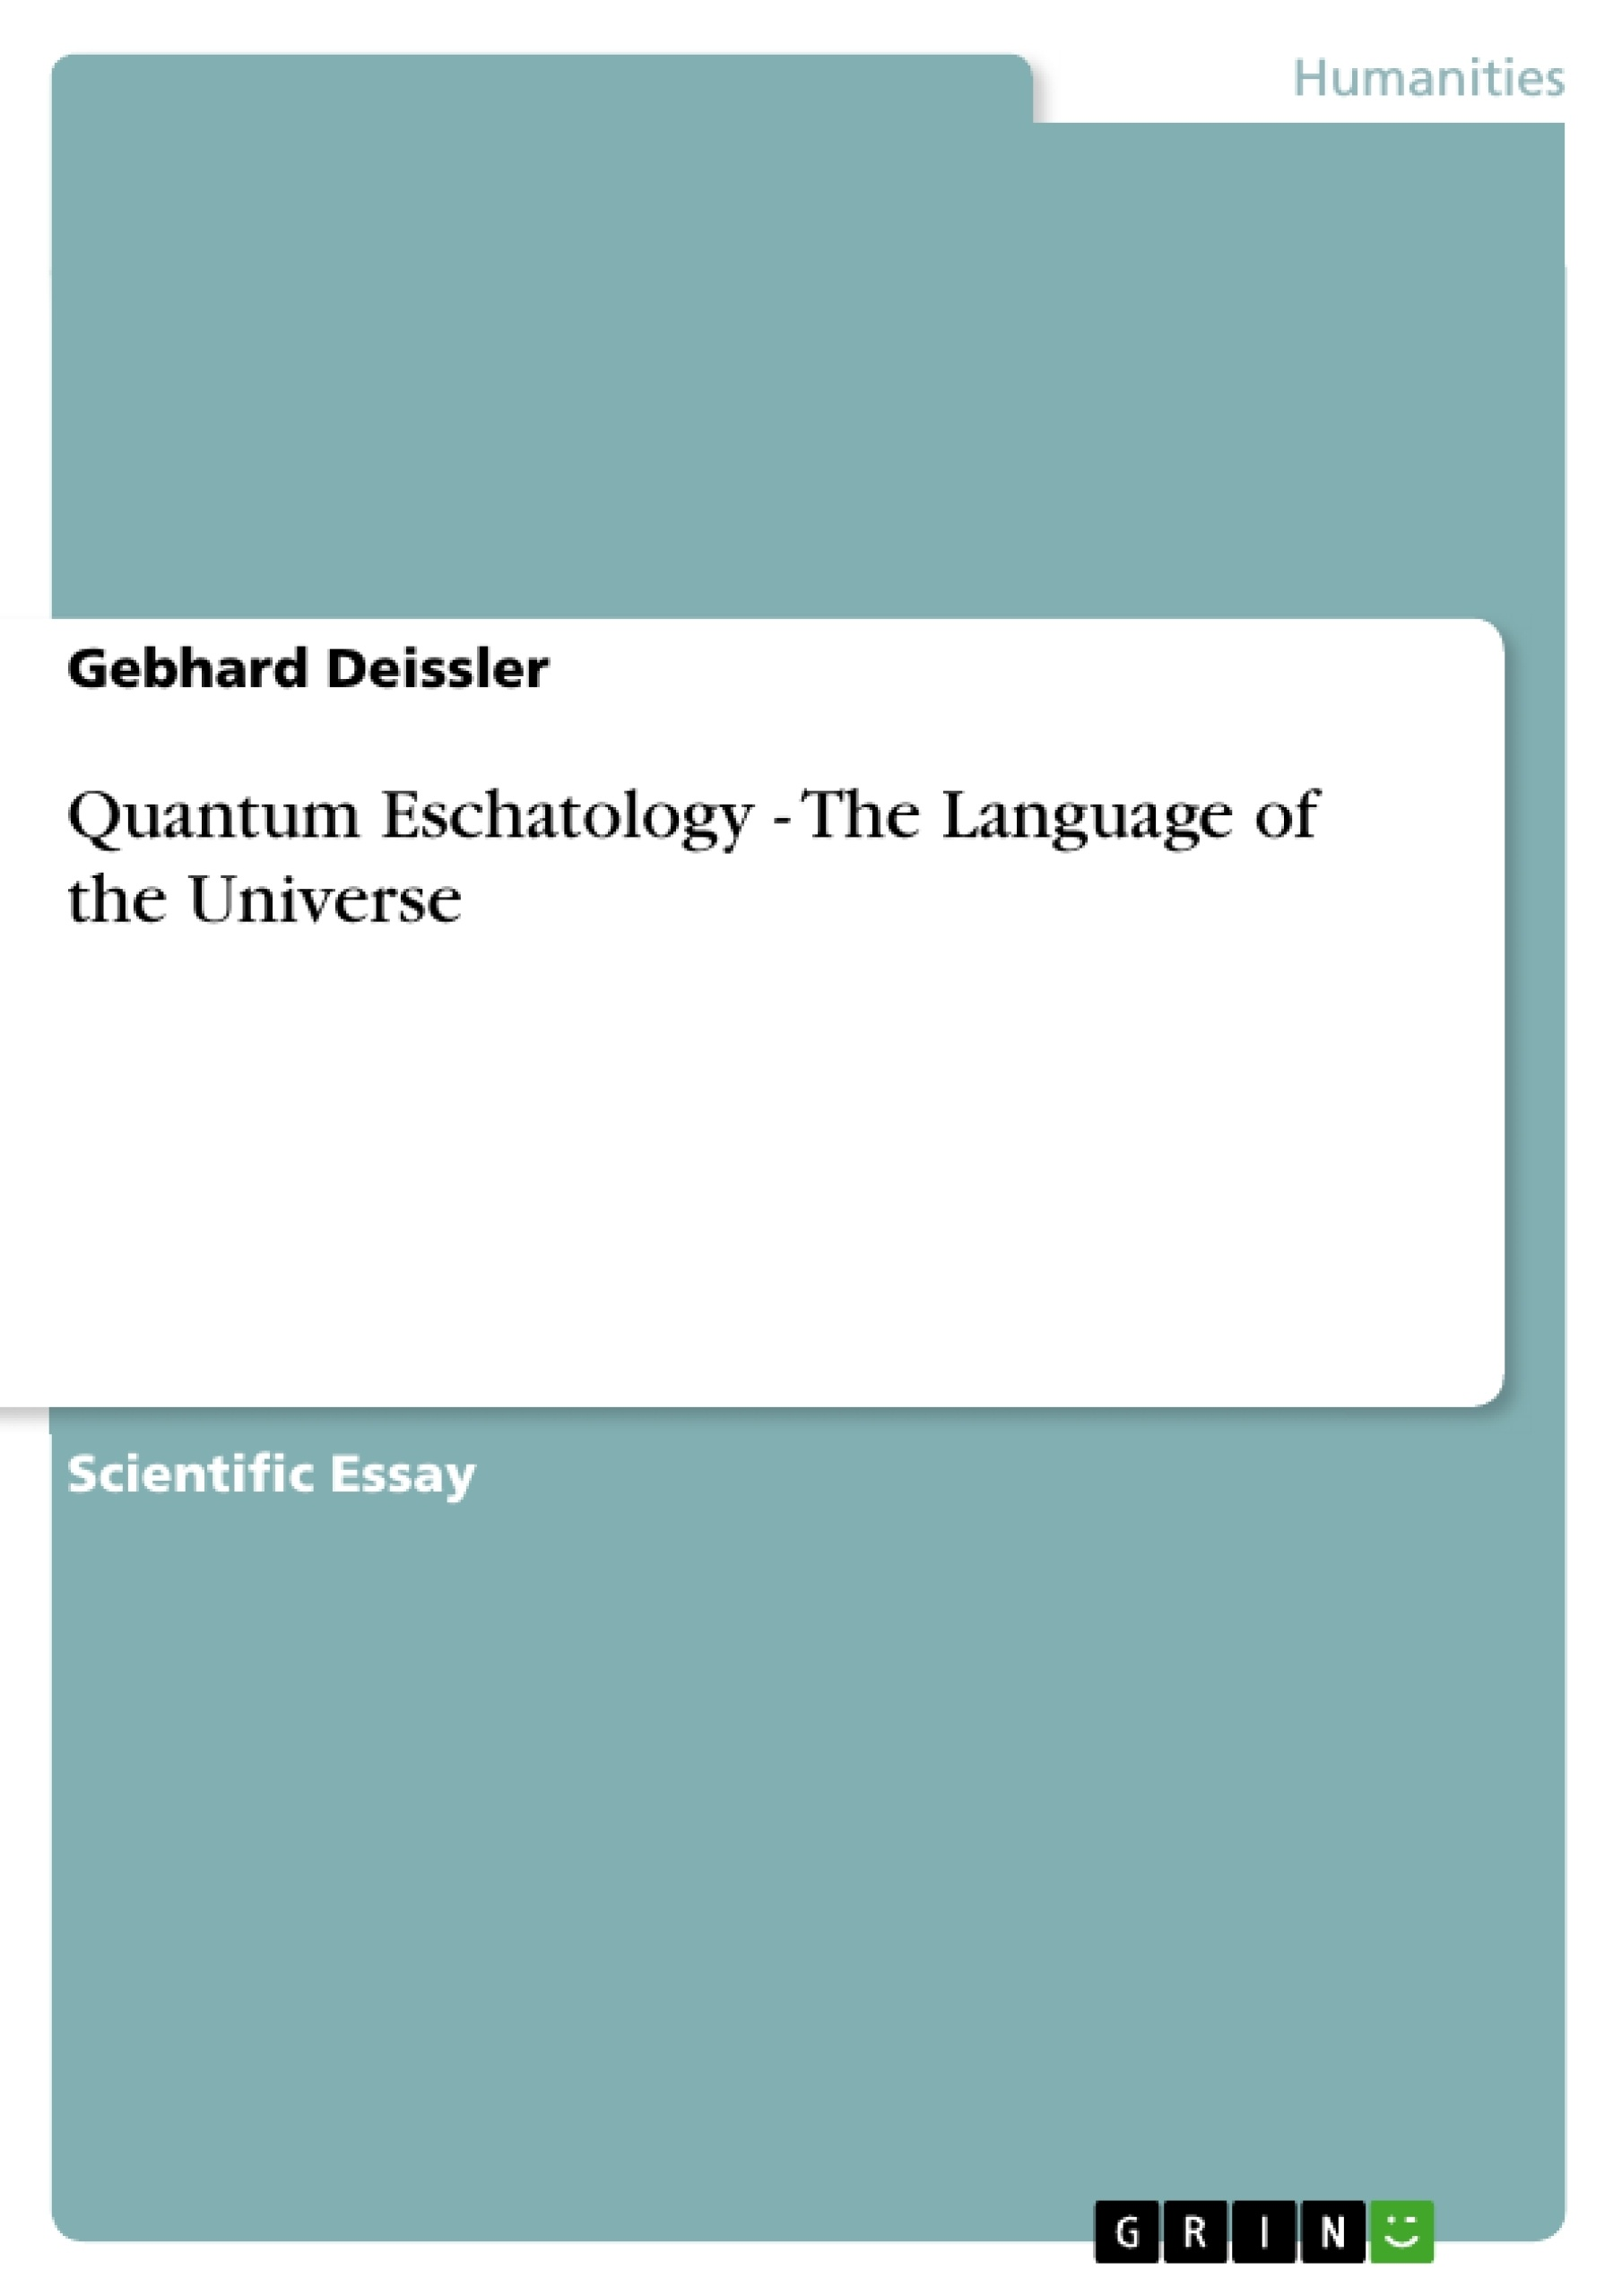 Title: Quantum Eschatology - The Language of the Universe